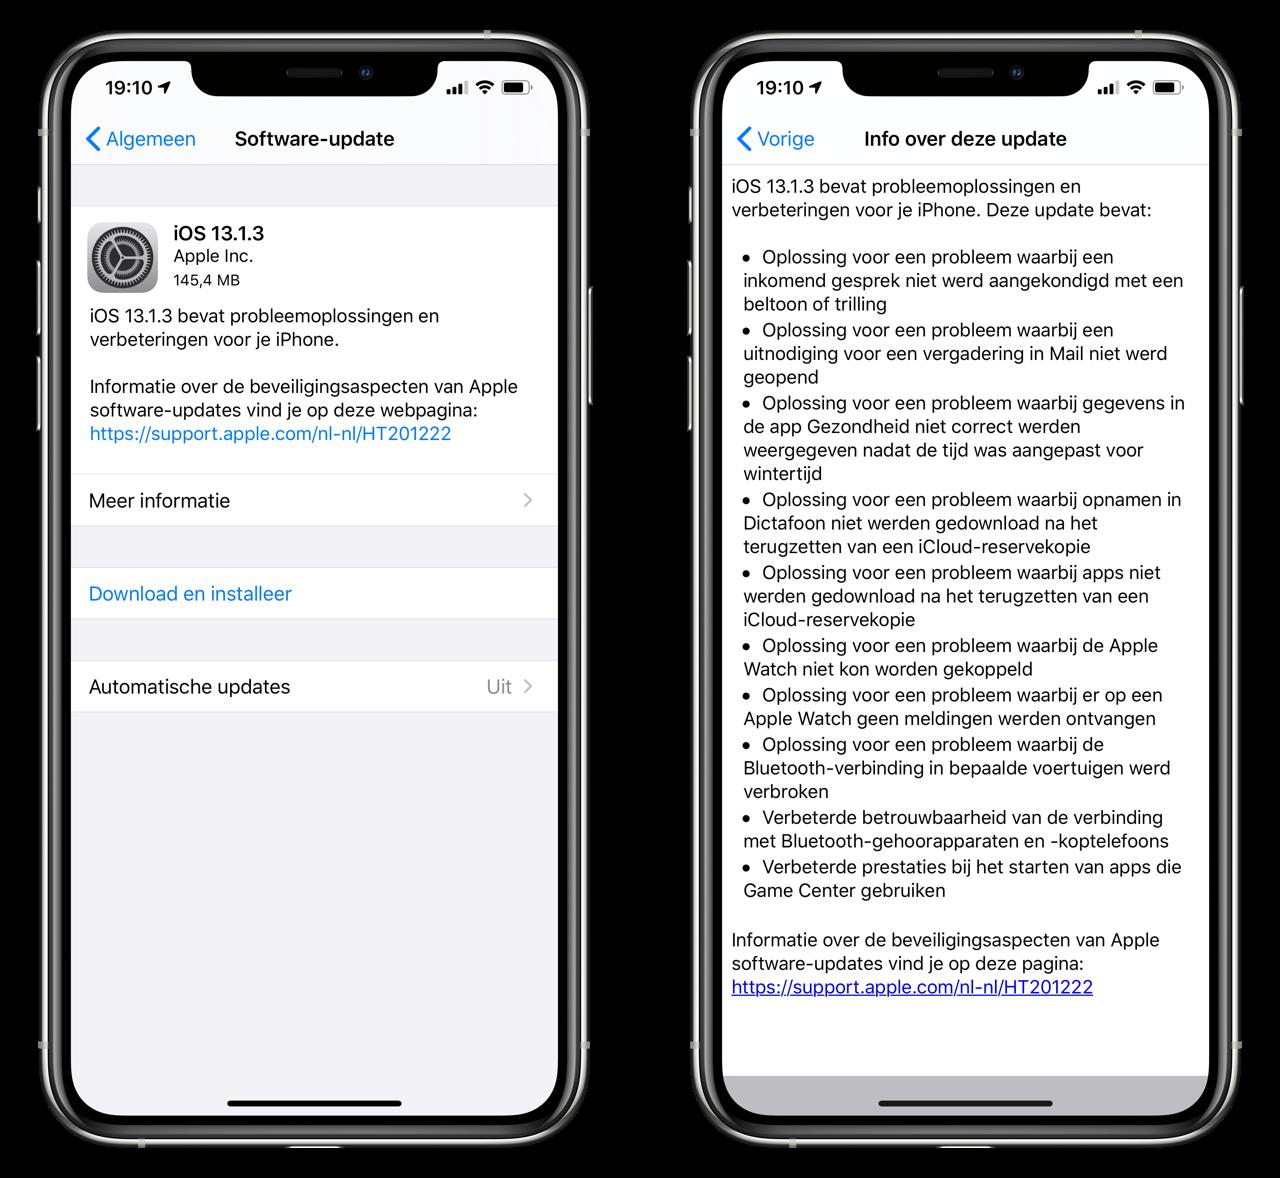 iOS 13.1.3 releasenotes